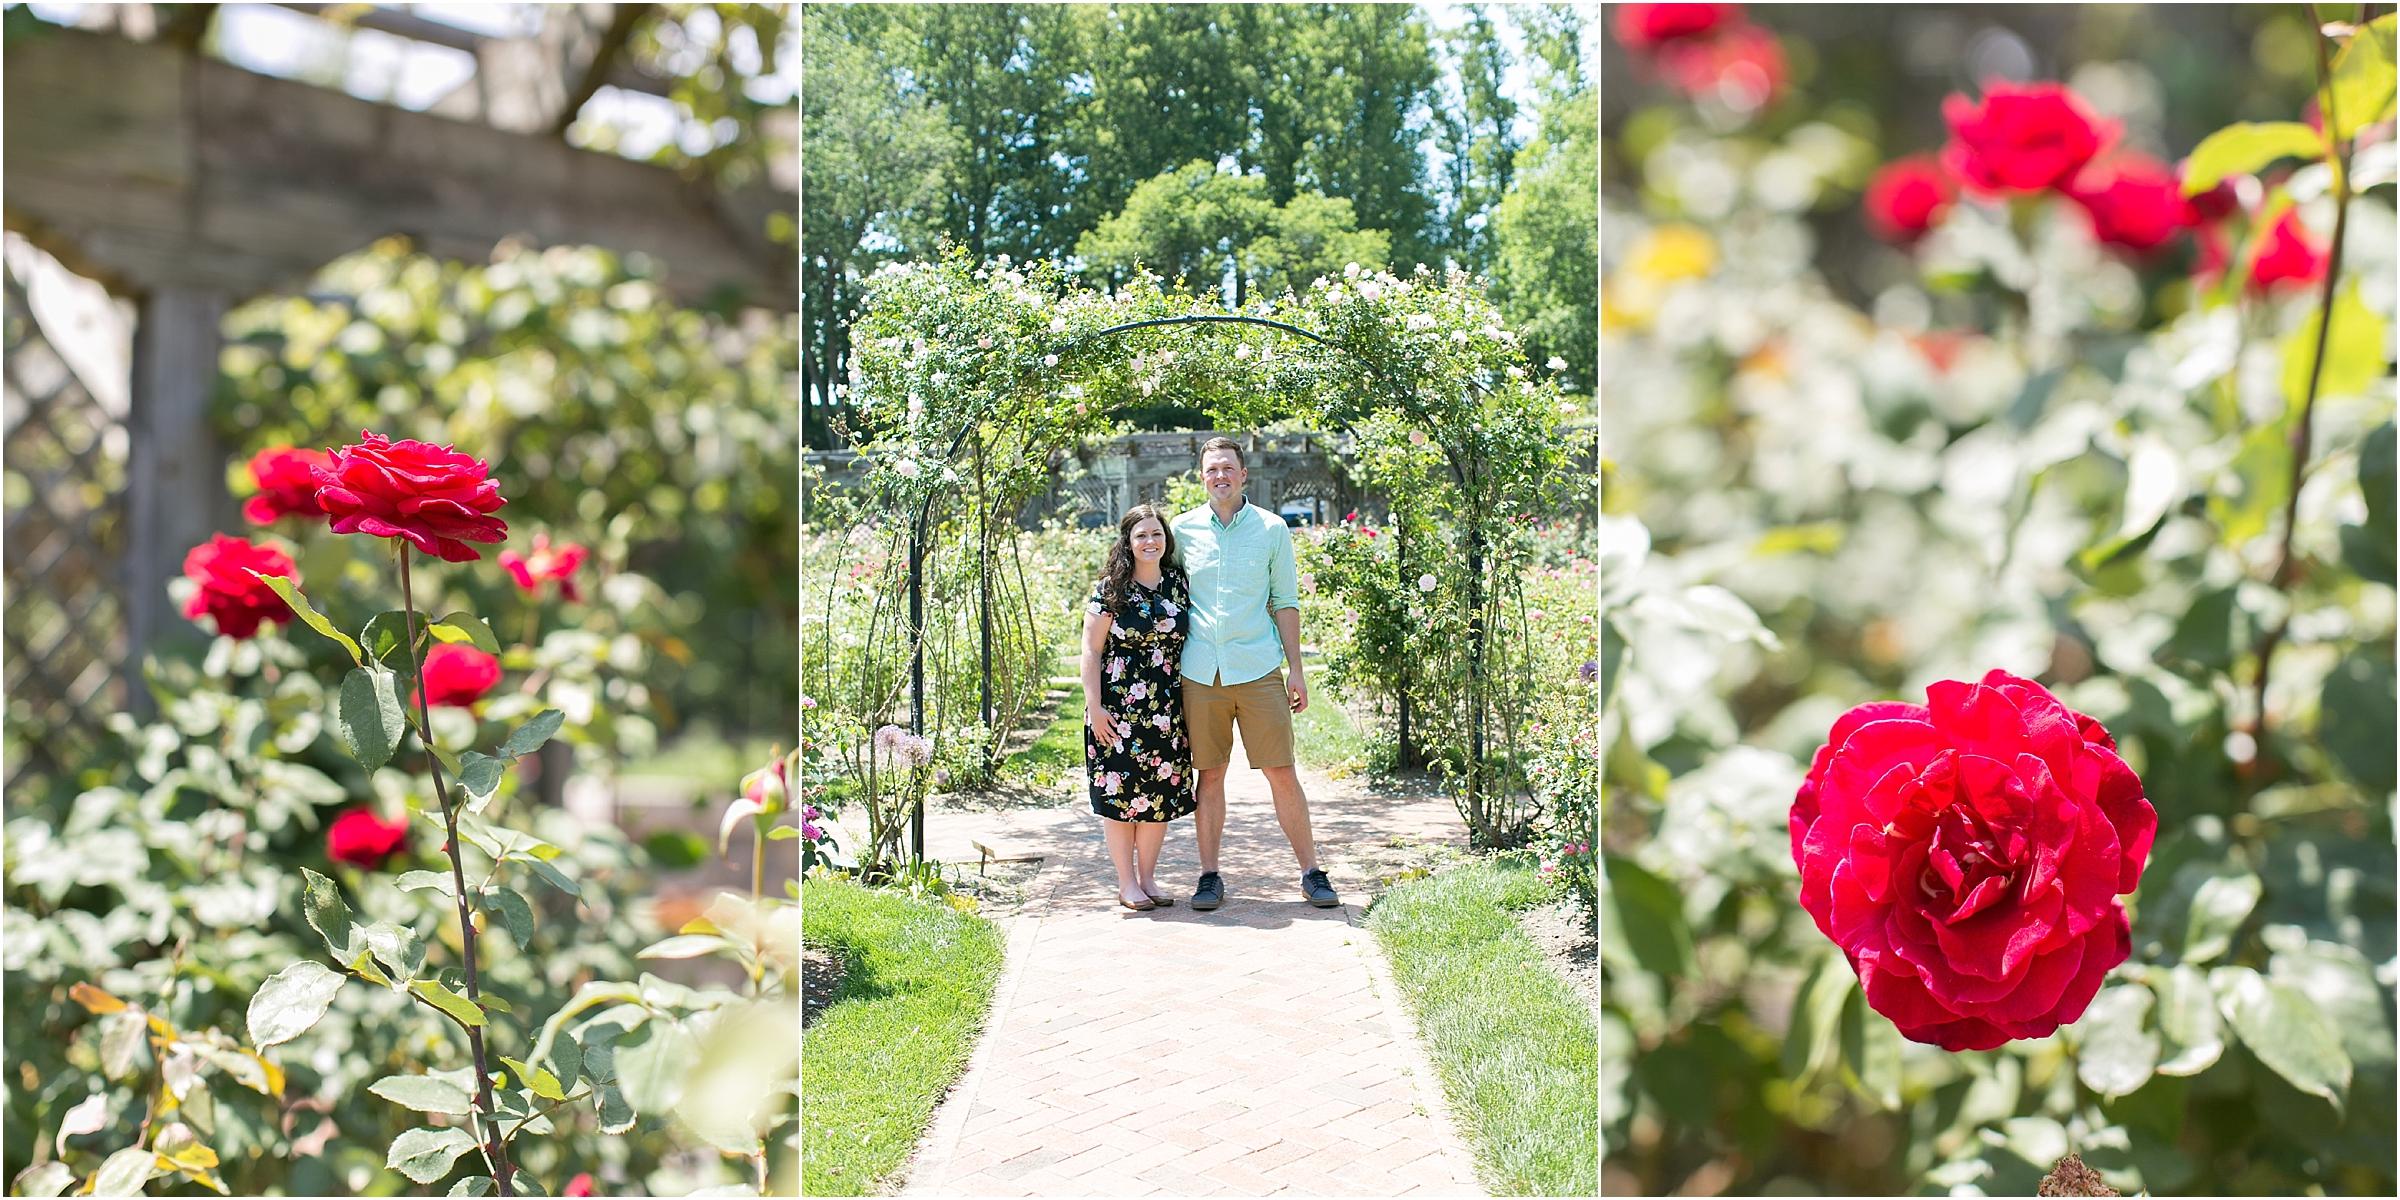 the Biltmore in Asheville North Carolina wedding rose garden